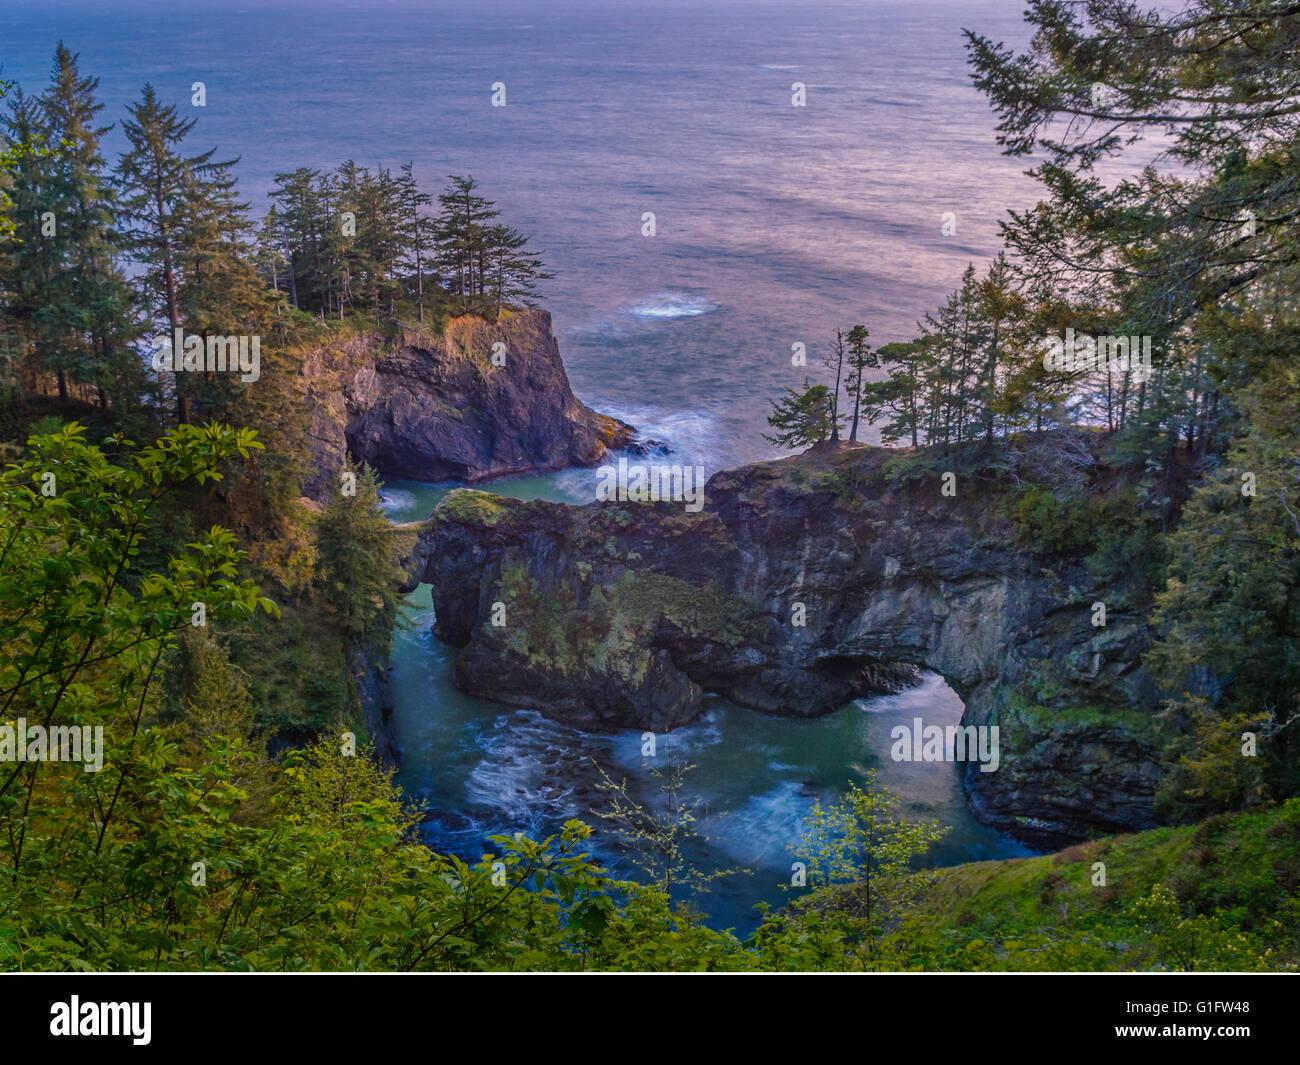 Natural Bridges Viewpoint, Samuel H. Boardman State Scenic Corridor, southern Oregon coast. Stock Photo